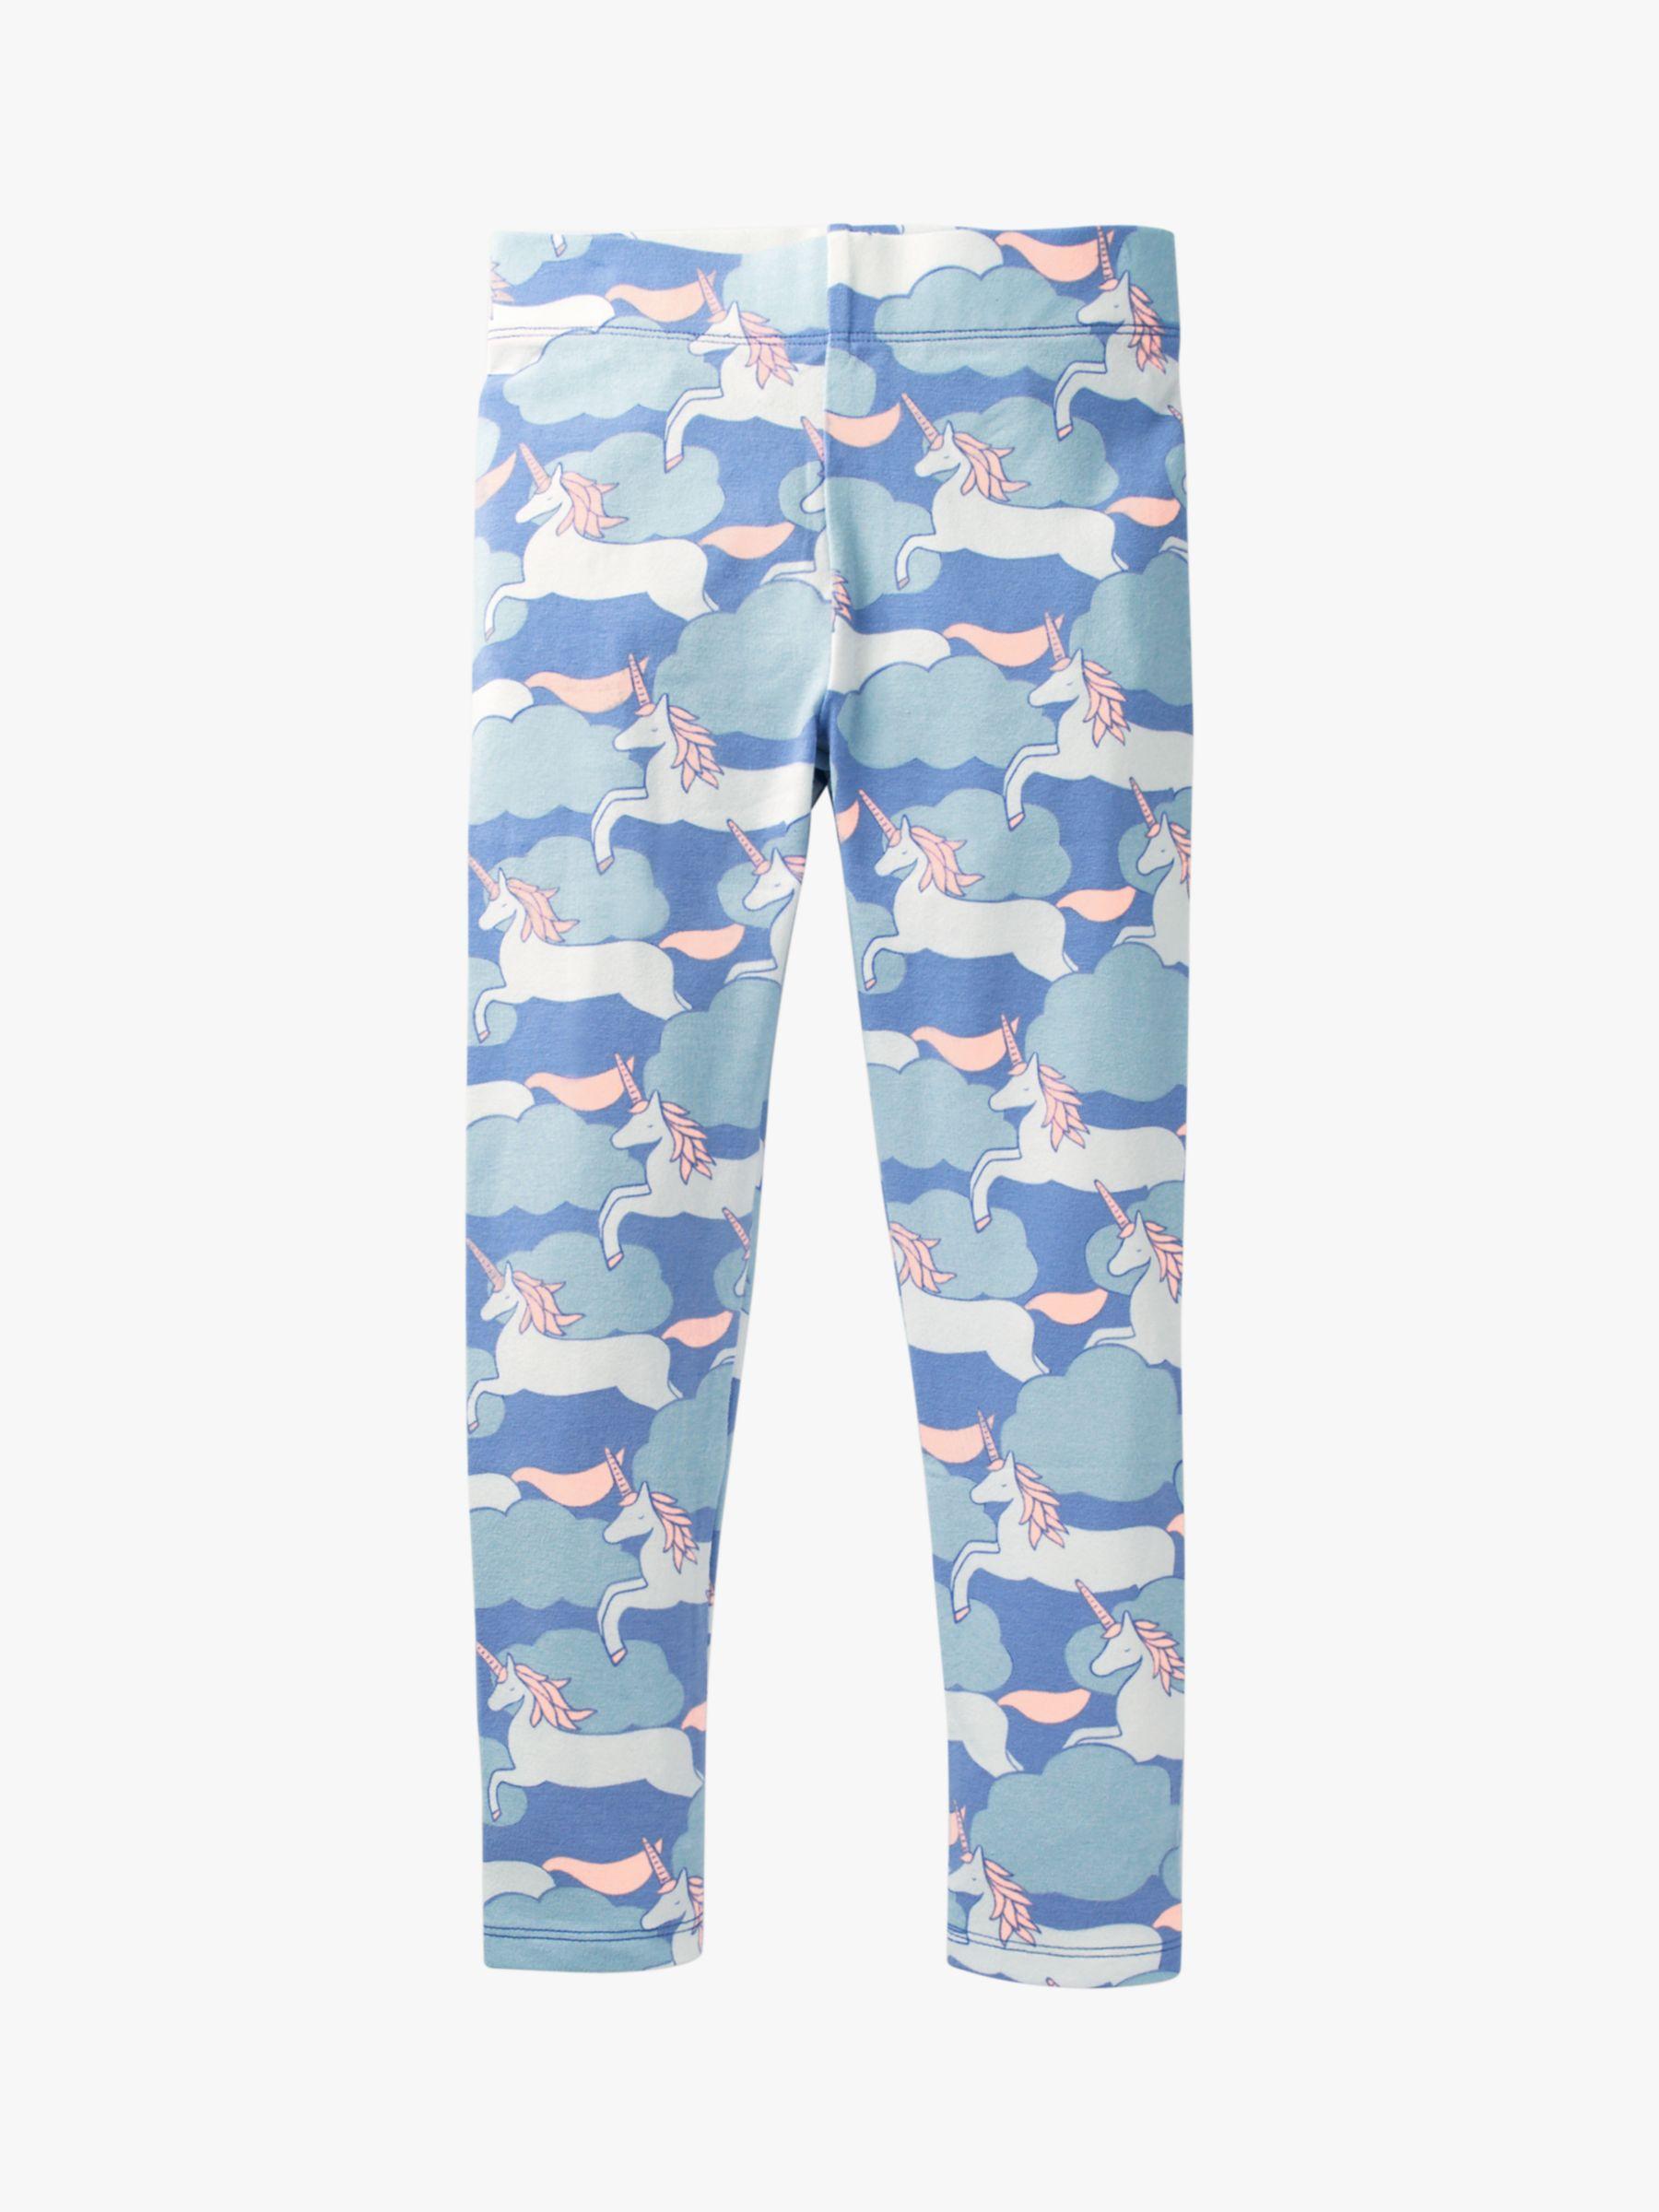 Mini Boden Mini Boden Girls' Fun Unicorn Print Leggings, Blue